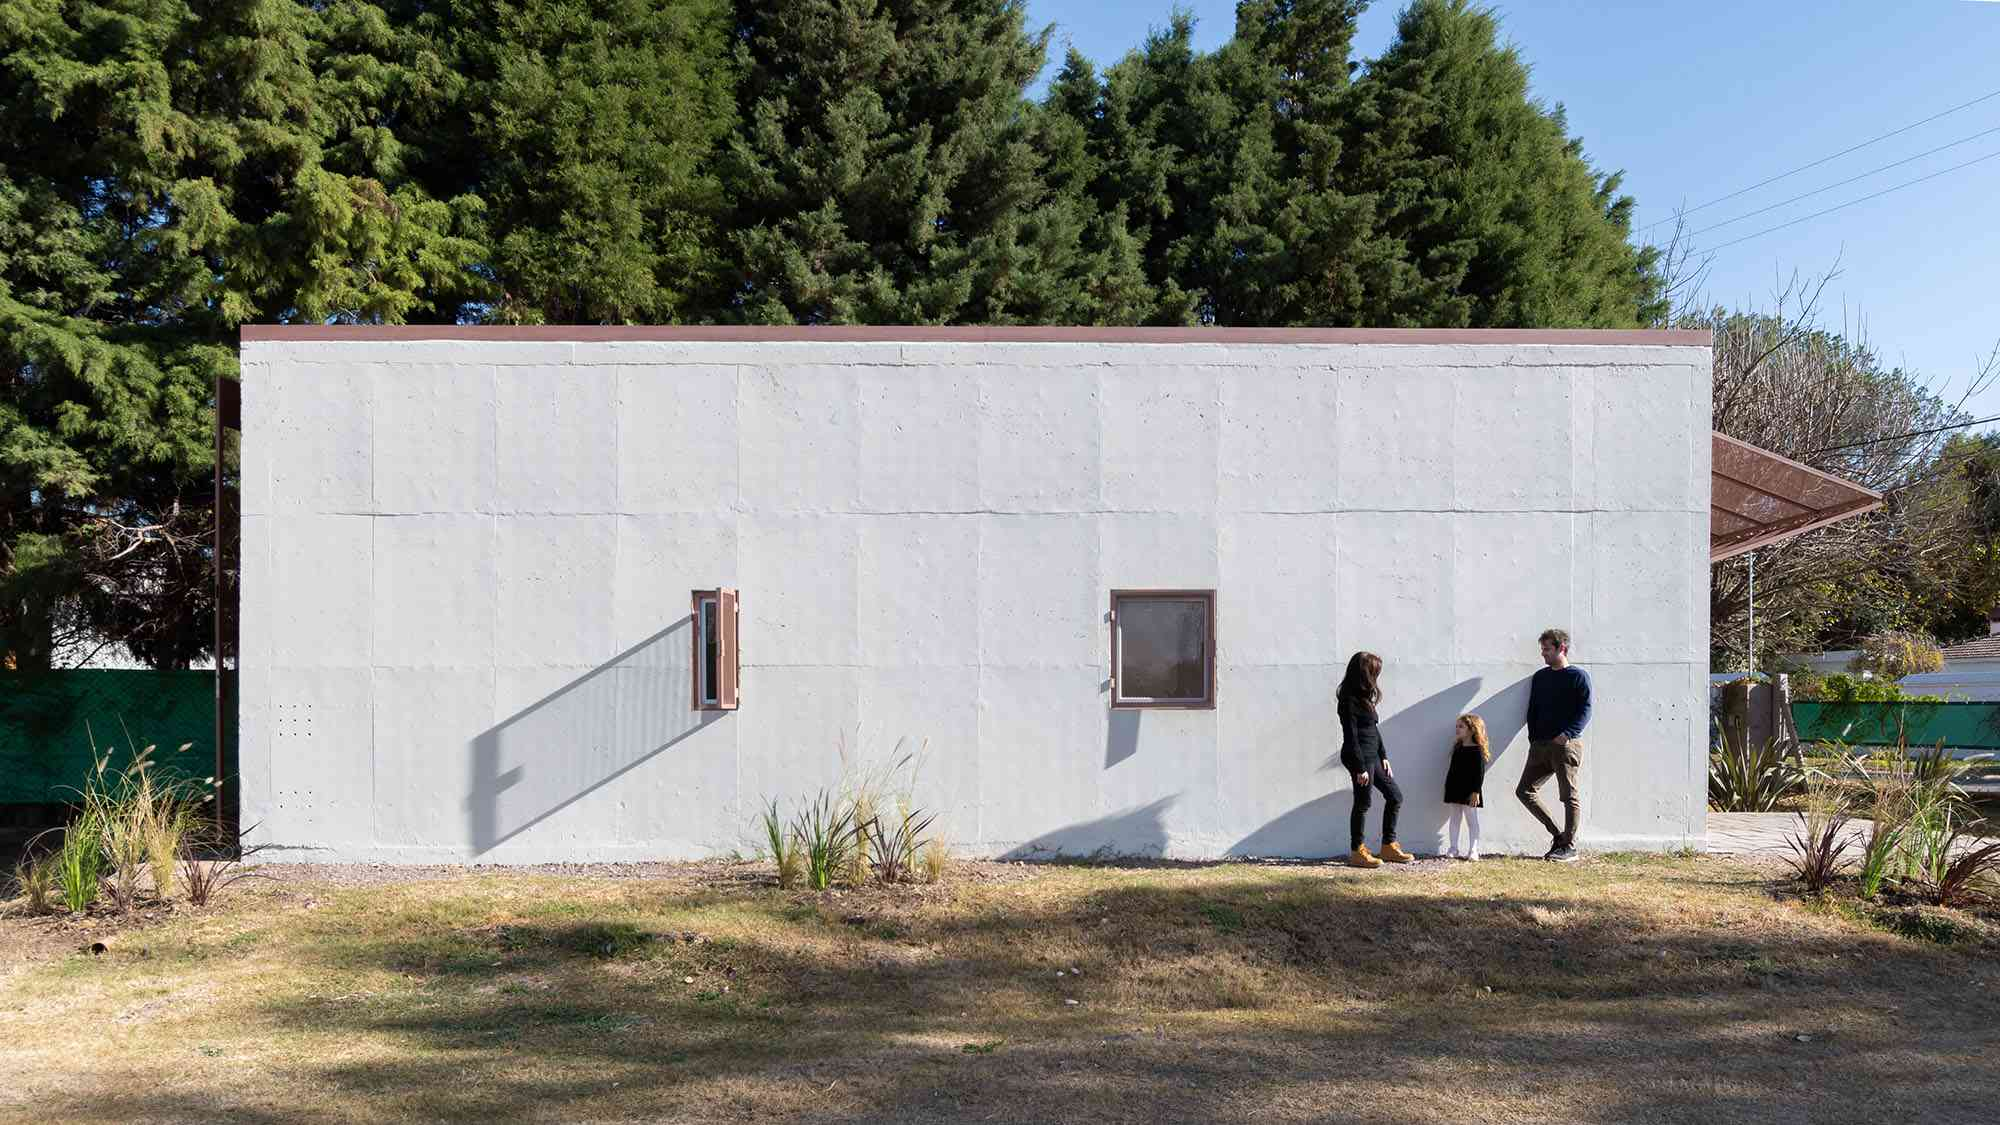 Hüga prefabricated house by Grandio side of house